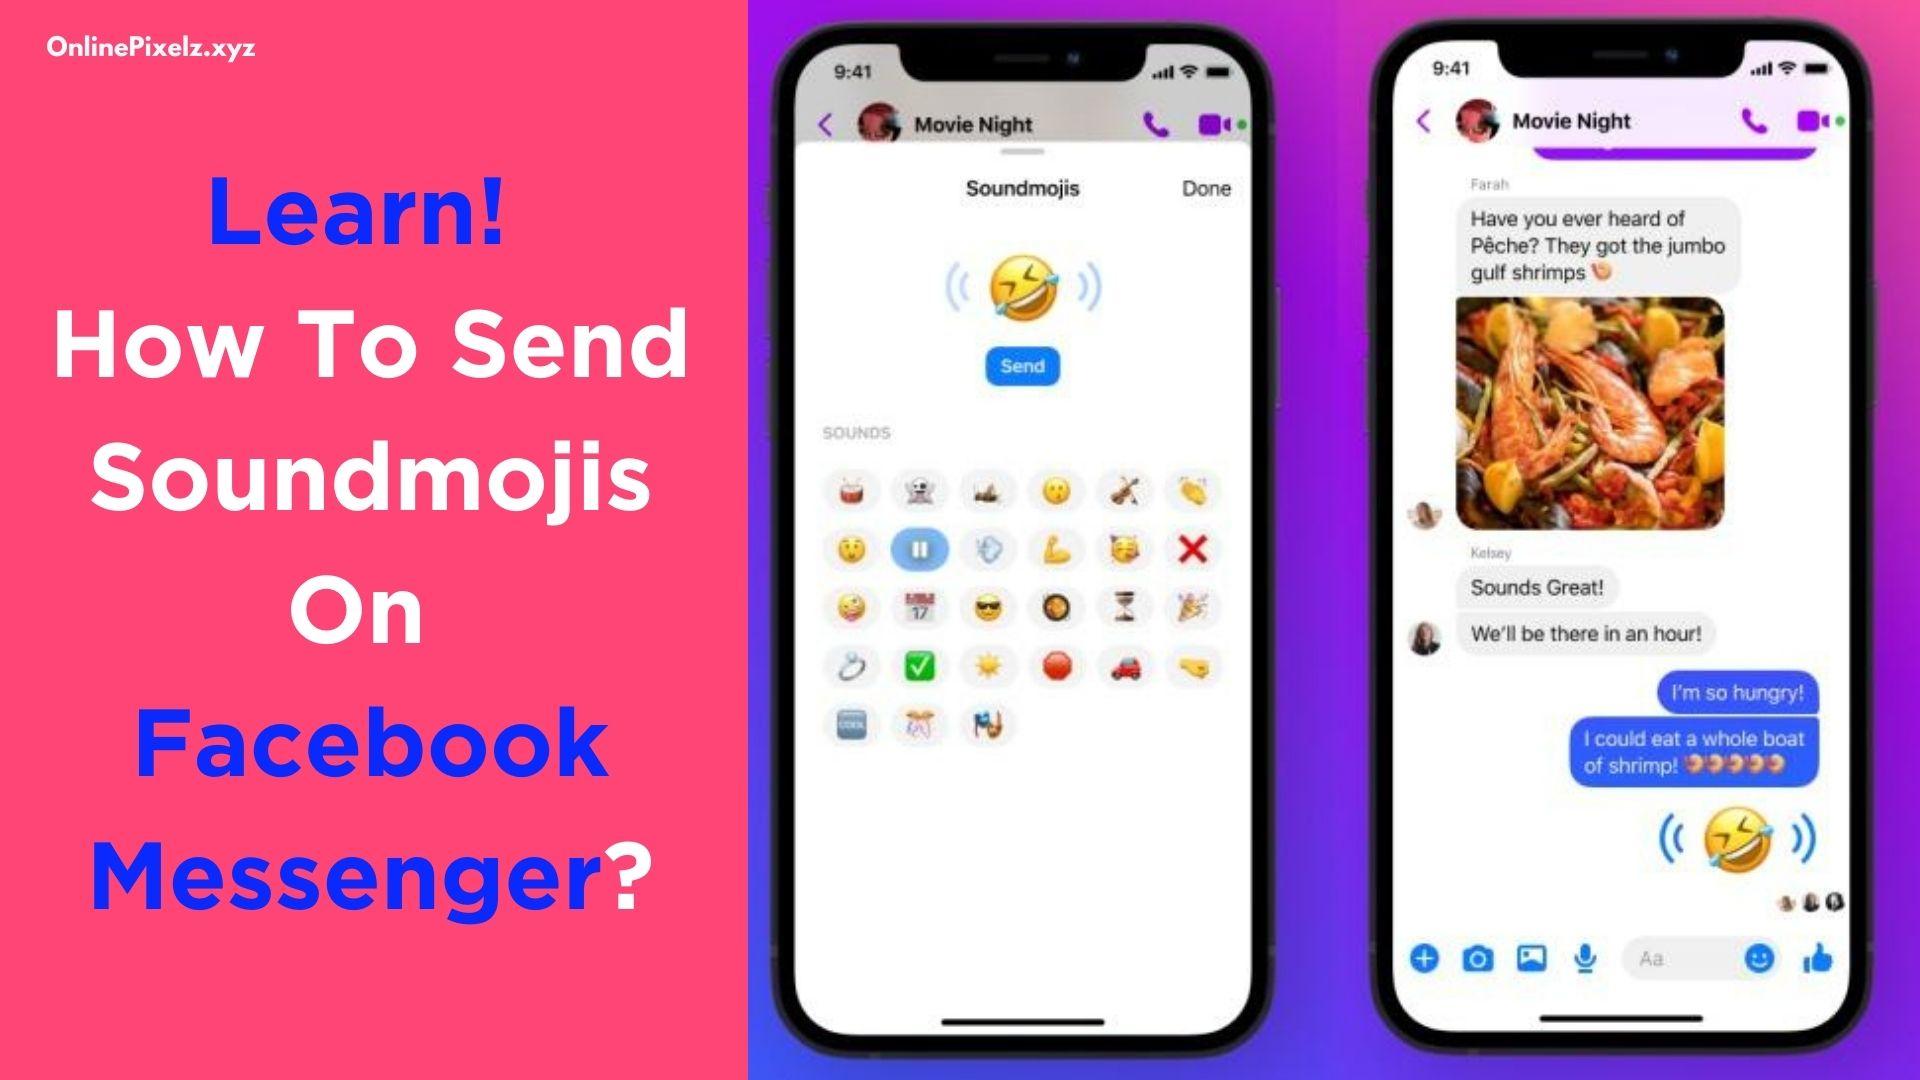 Send Soundmojis On Facebook Messenger